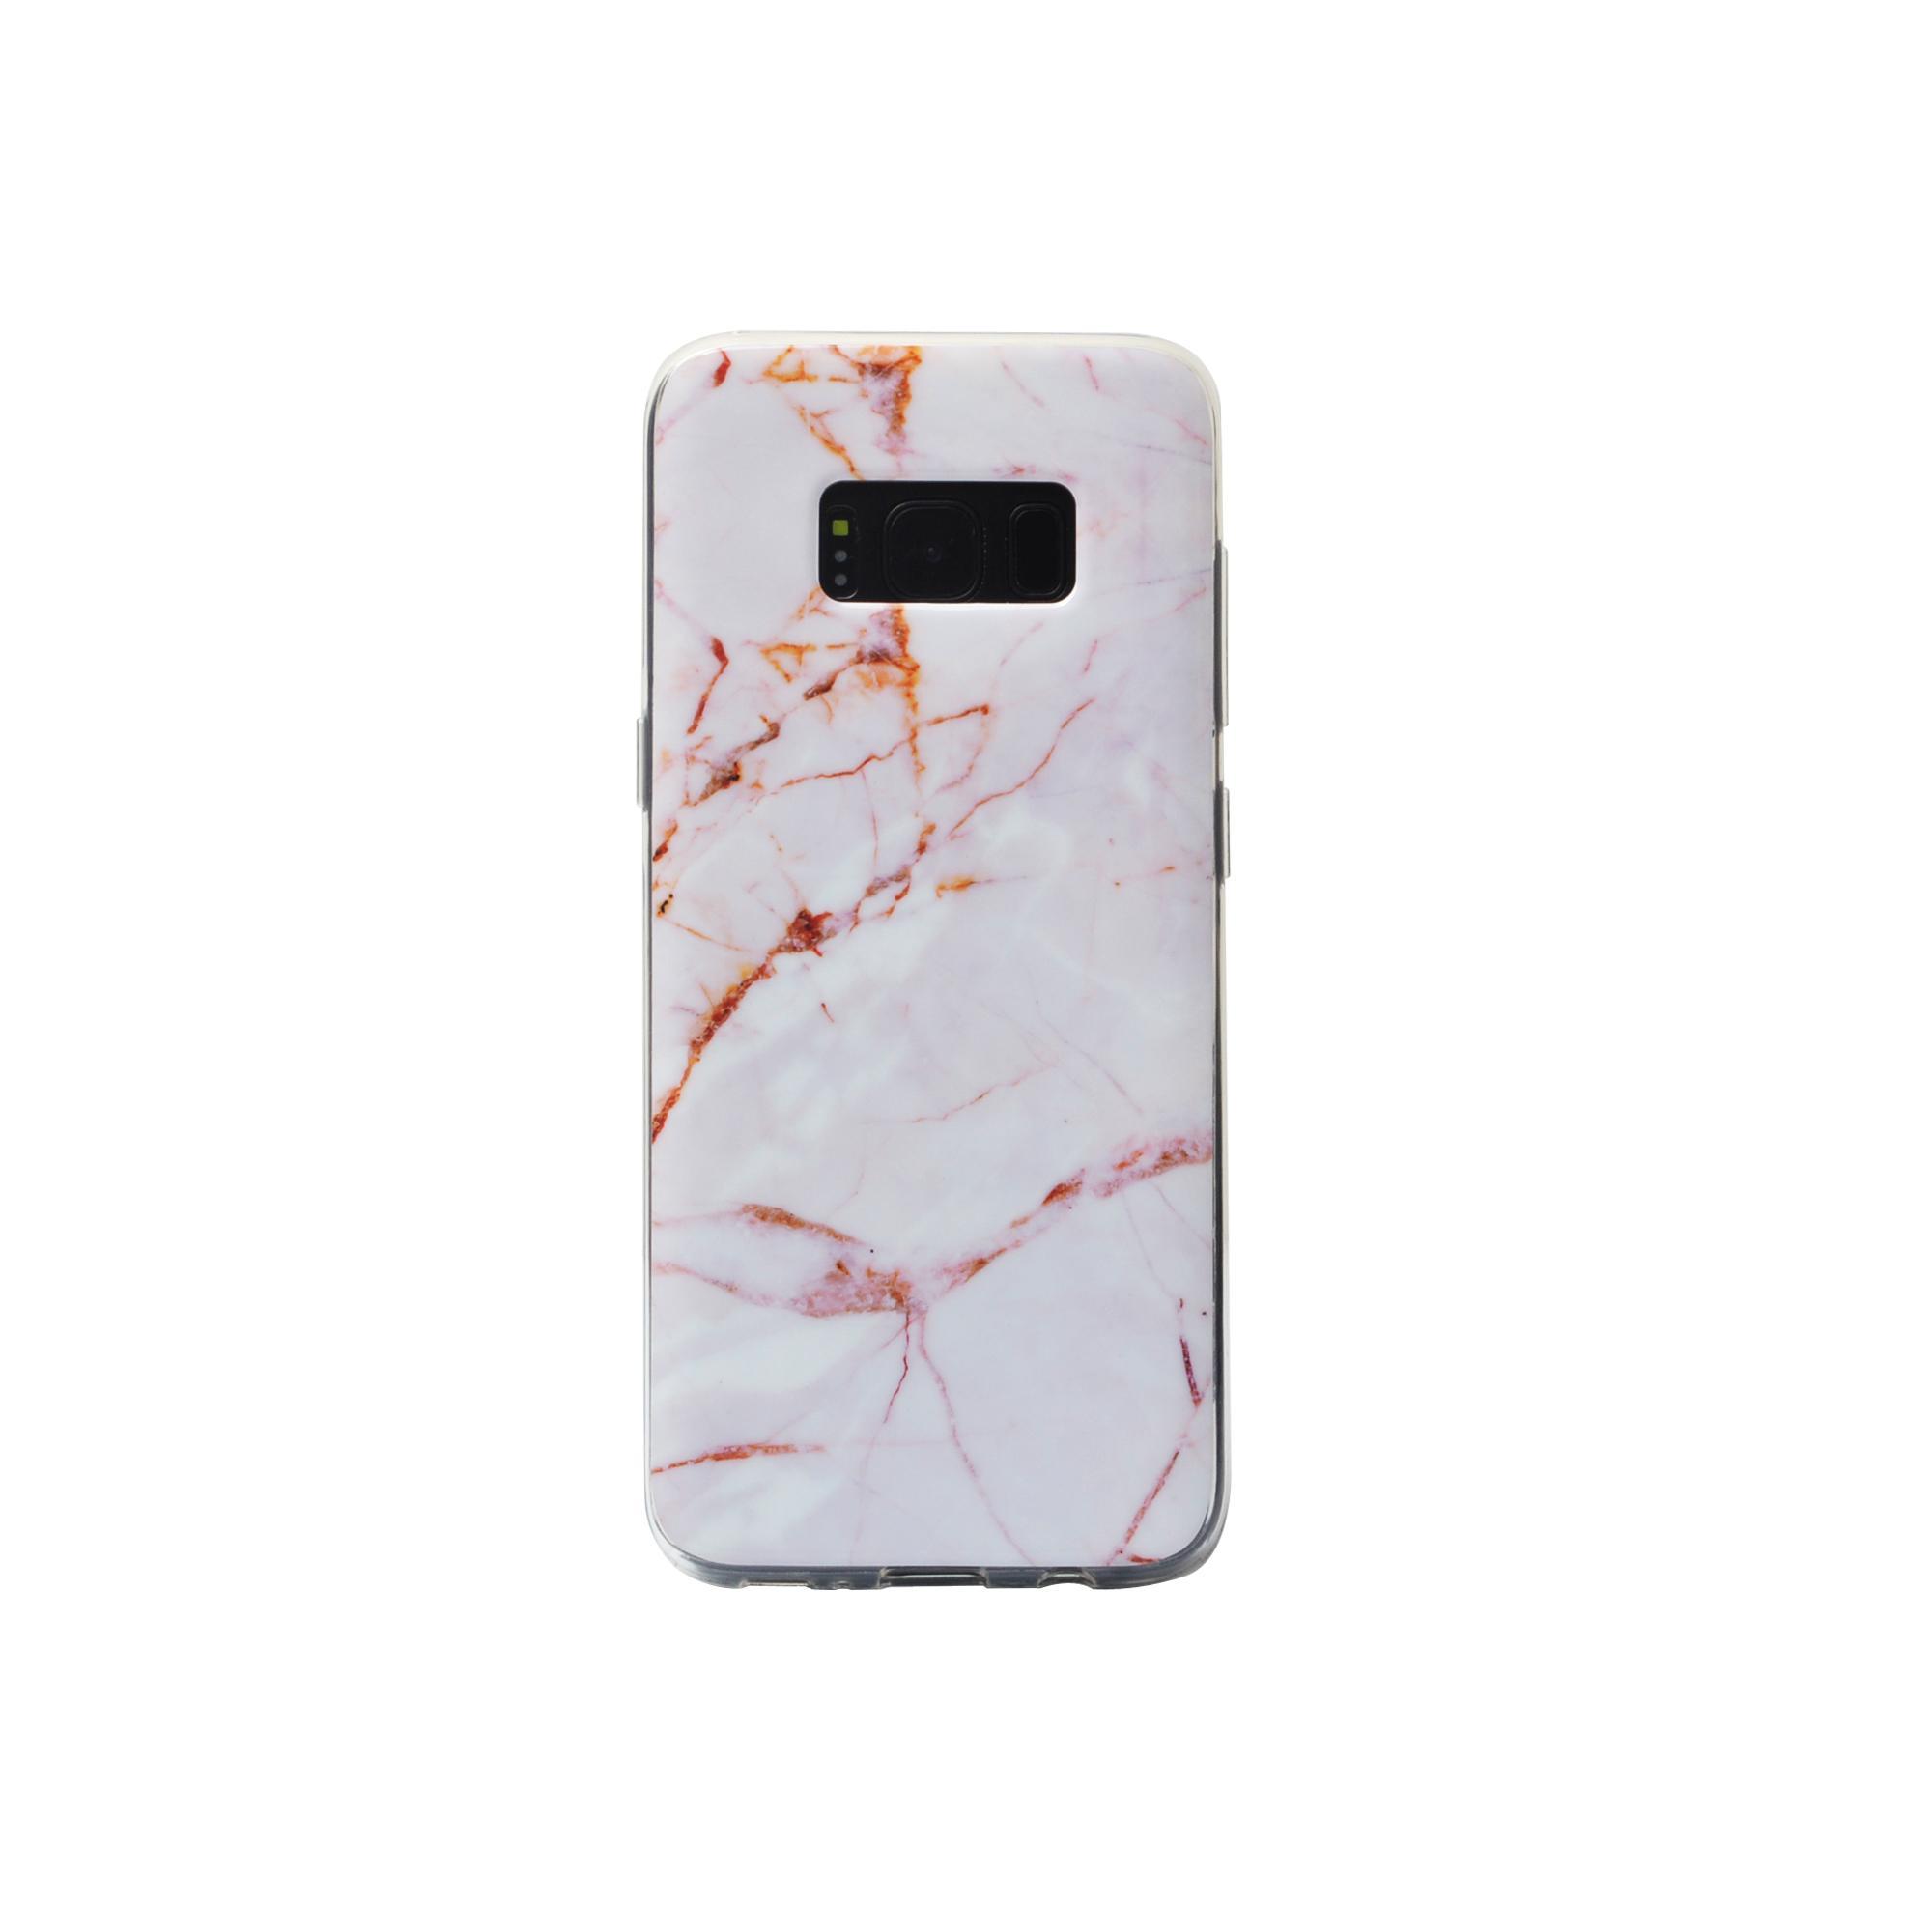 IMD Samsung Galaxy S8 Glossy Soft Marble TPU Case 3